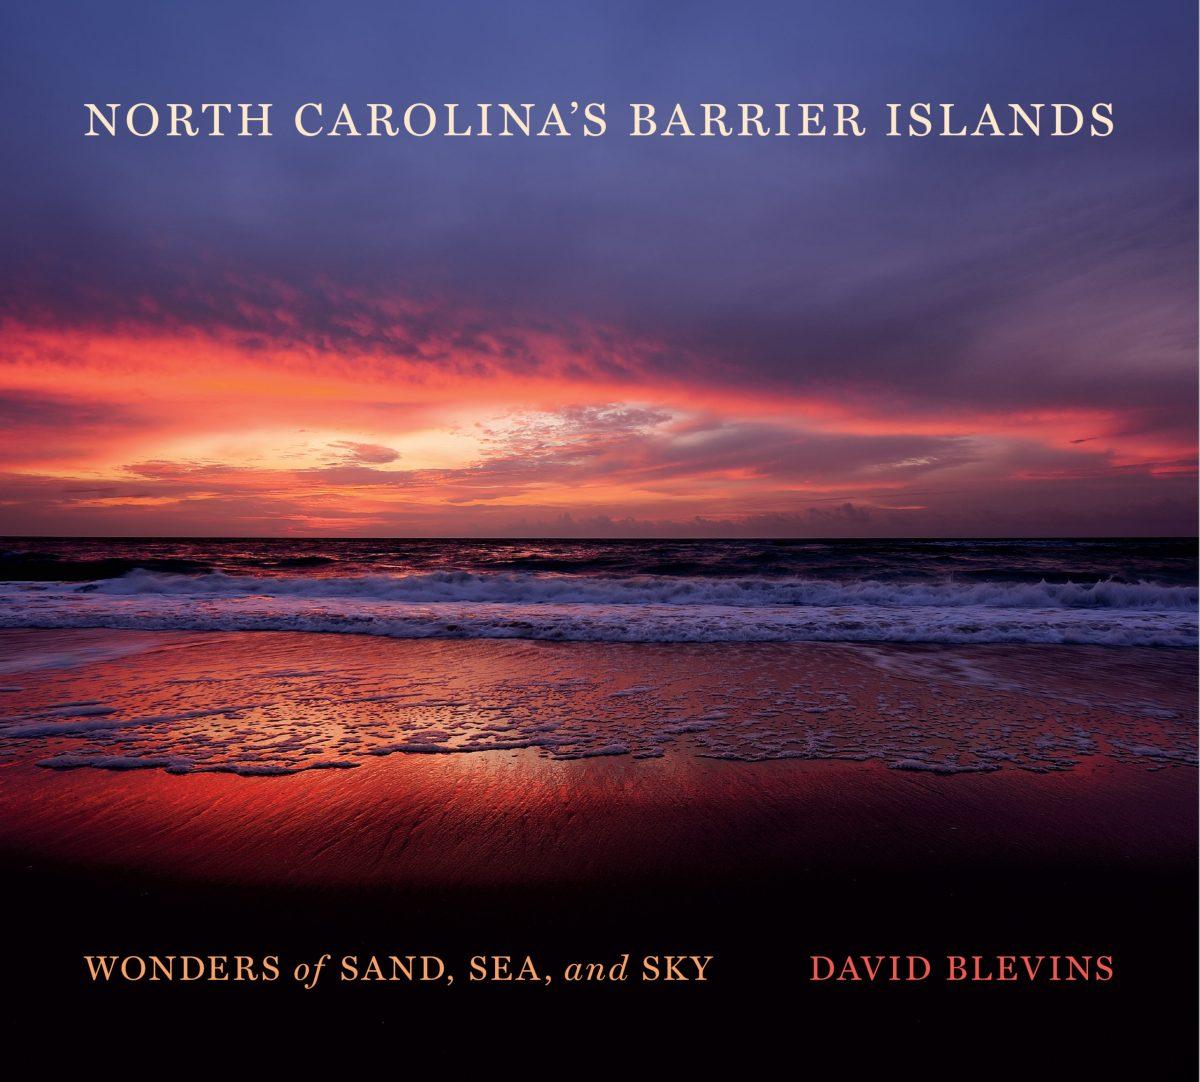 David Blevins: North Carolina's Barrier Islands: Wonders of Sand, Sea, and Sky